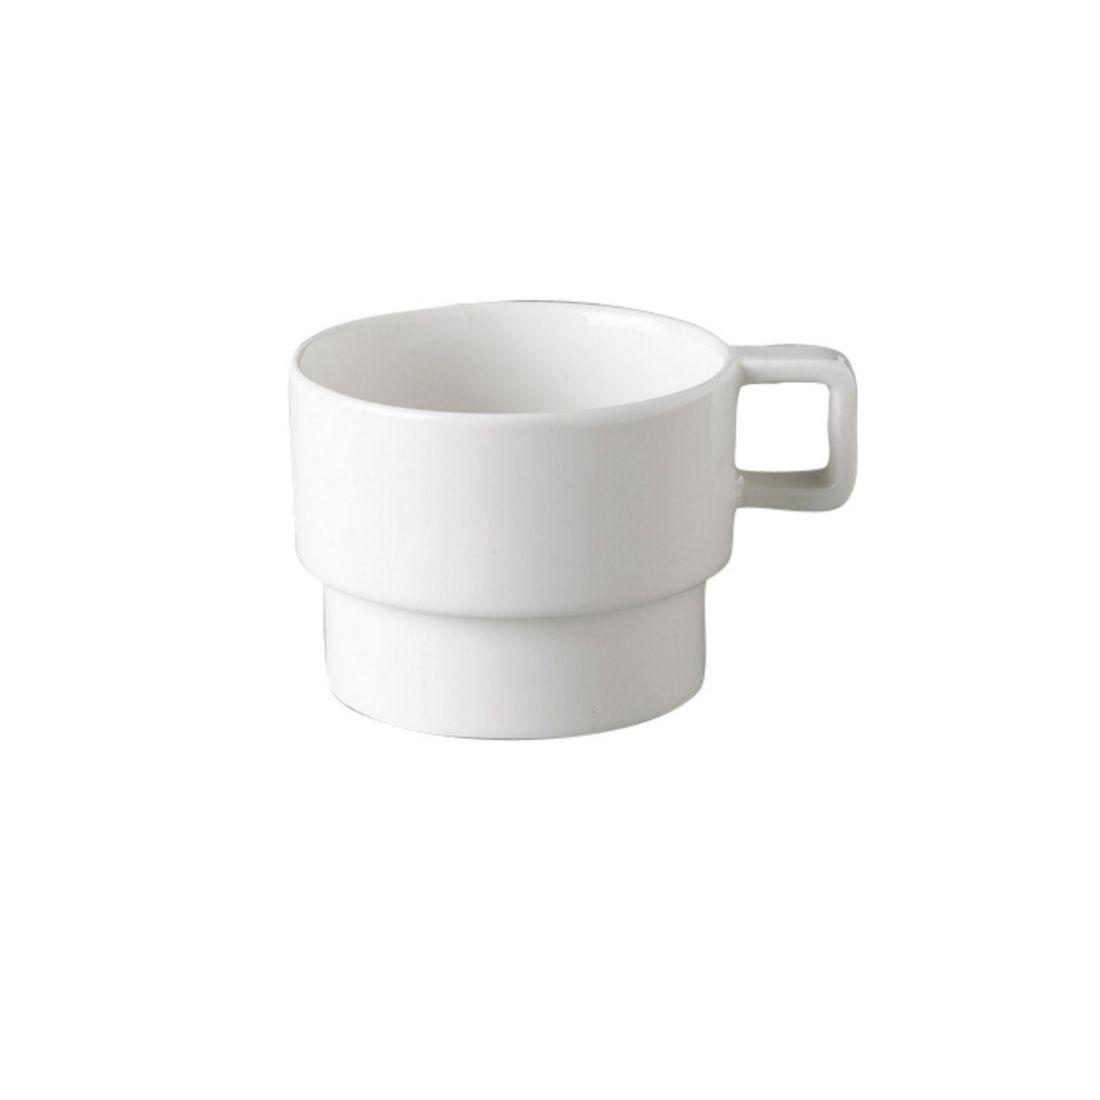 Šálek na espresso Nordic 90 ml